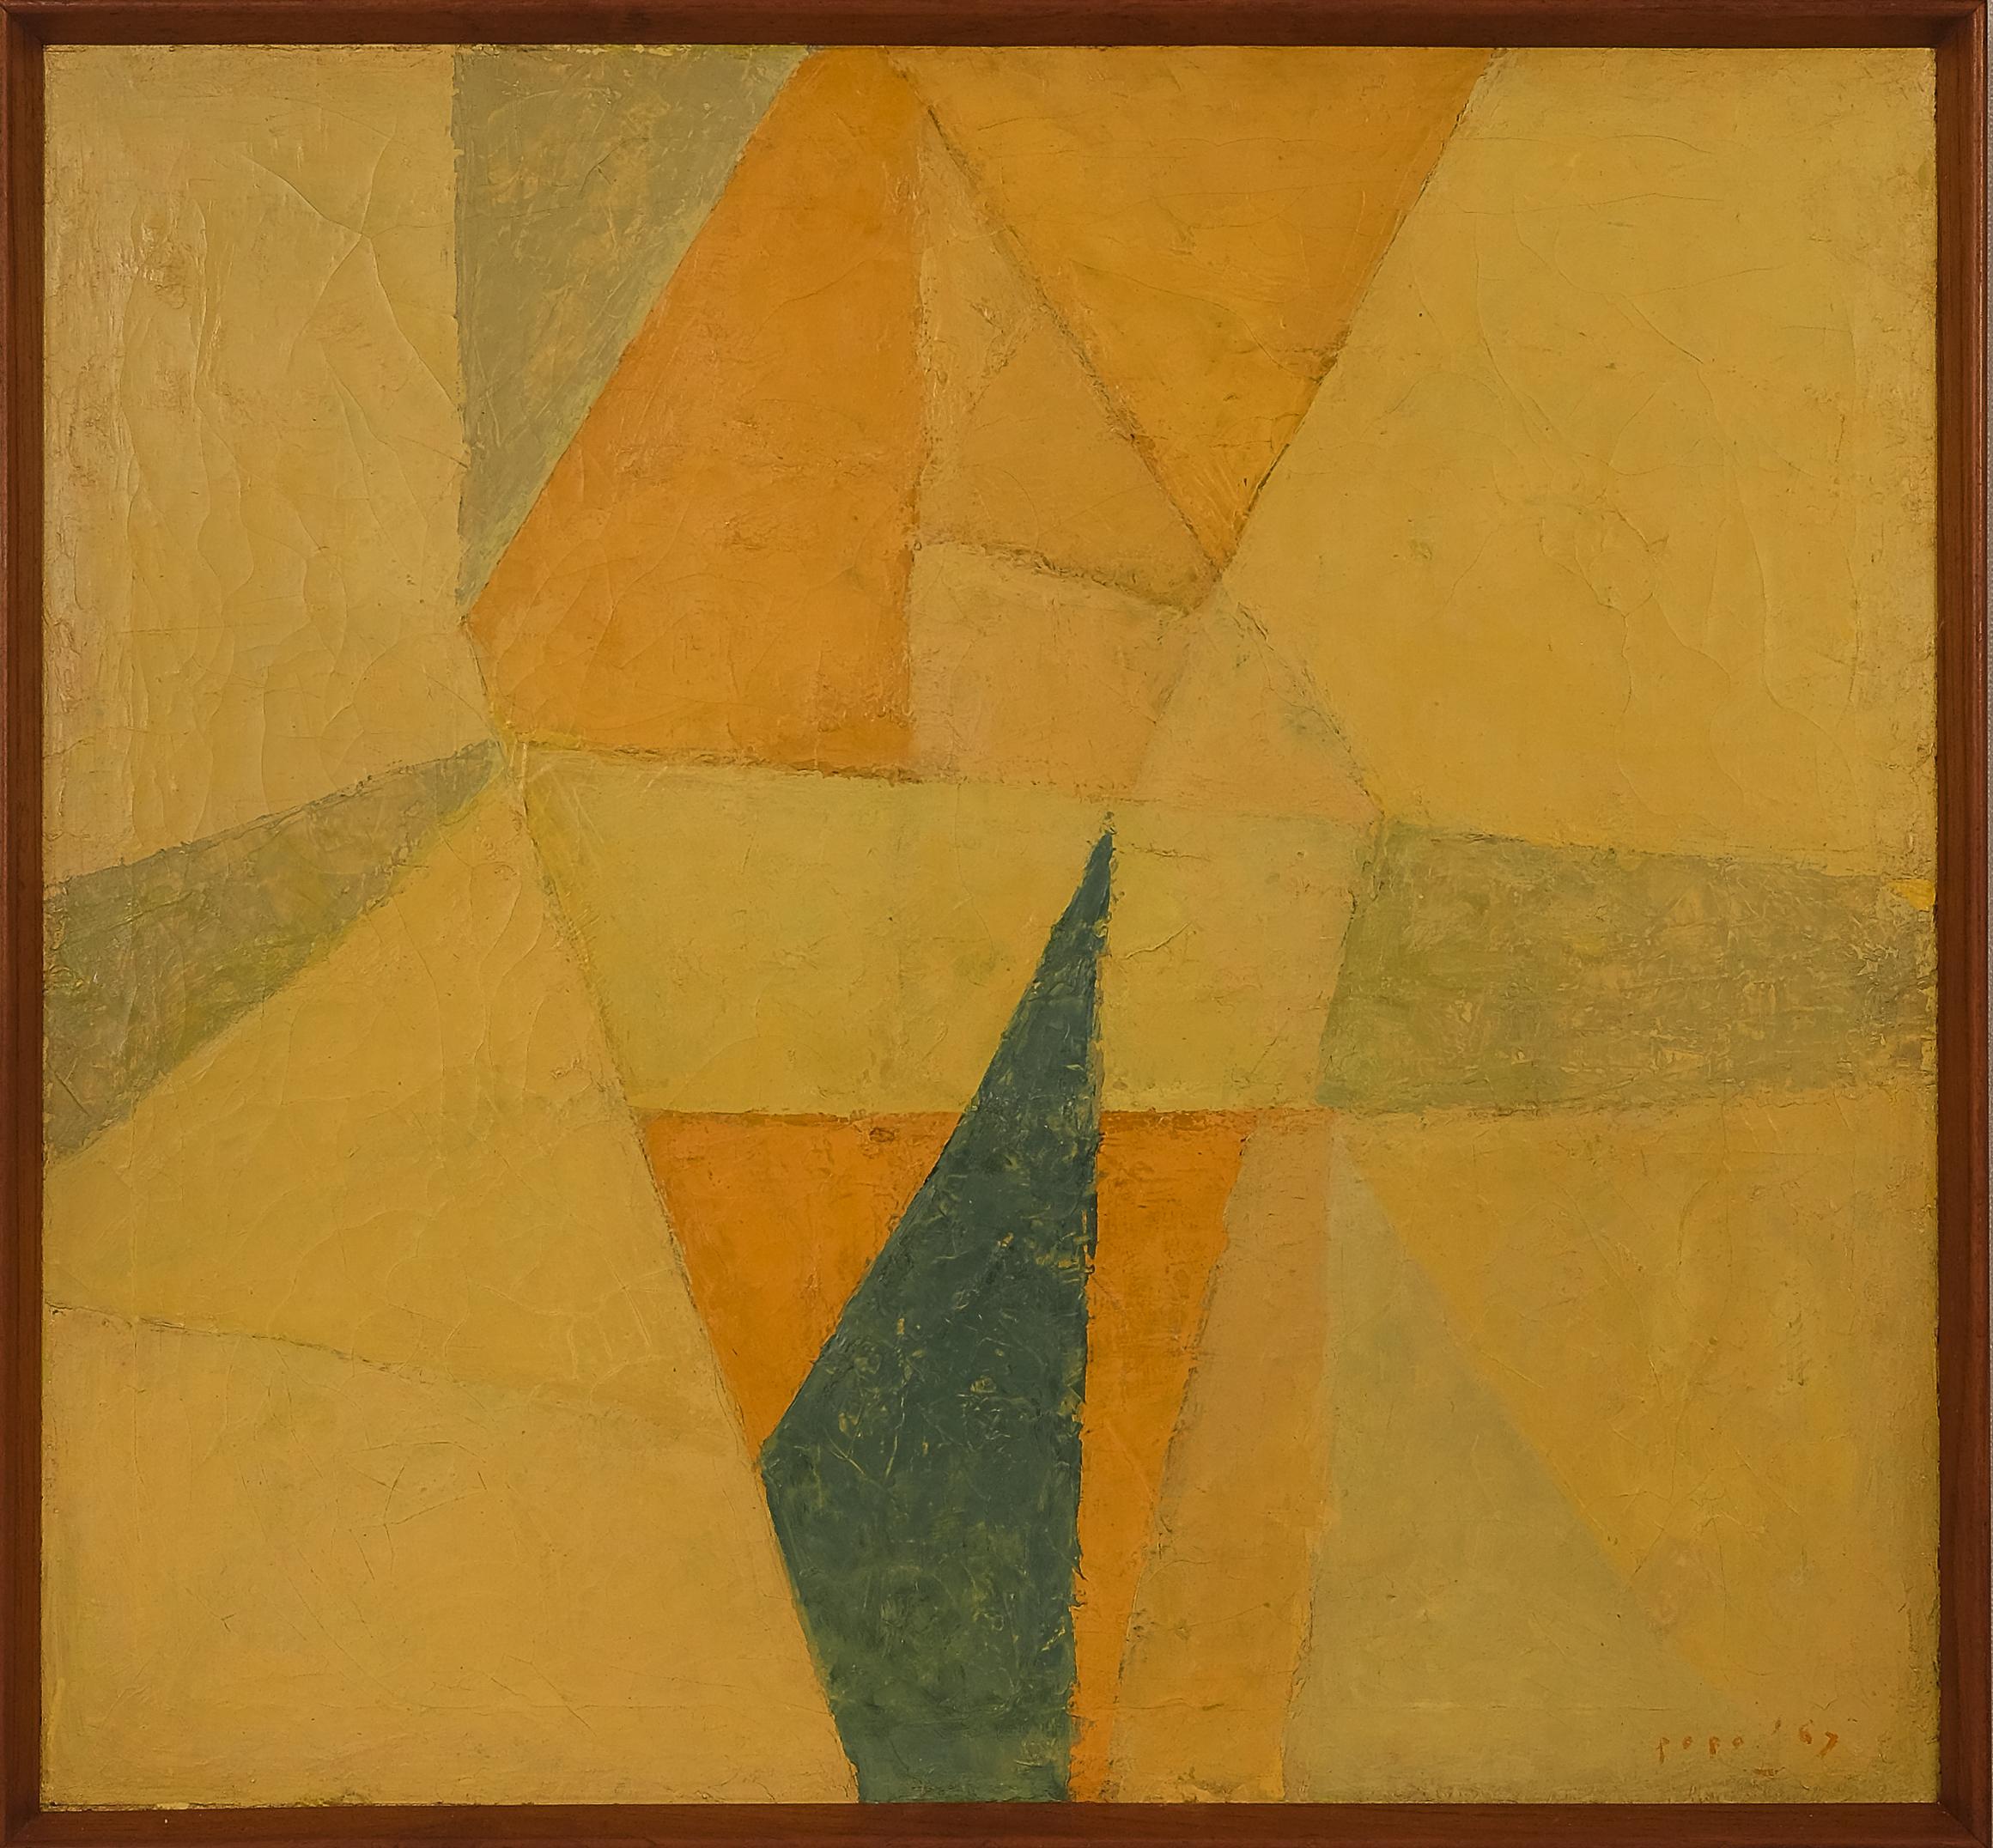 Popo Iskandar, Bunga Kuning (Yellow Flower), ooc, 60 x 65 cm, 1967.jpeg